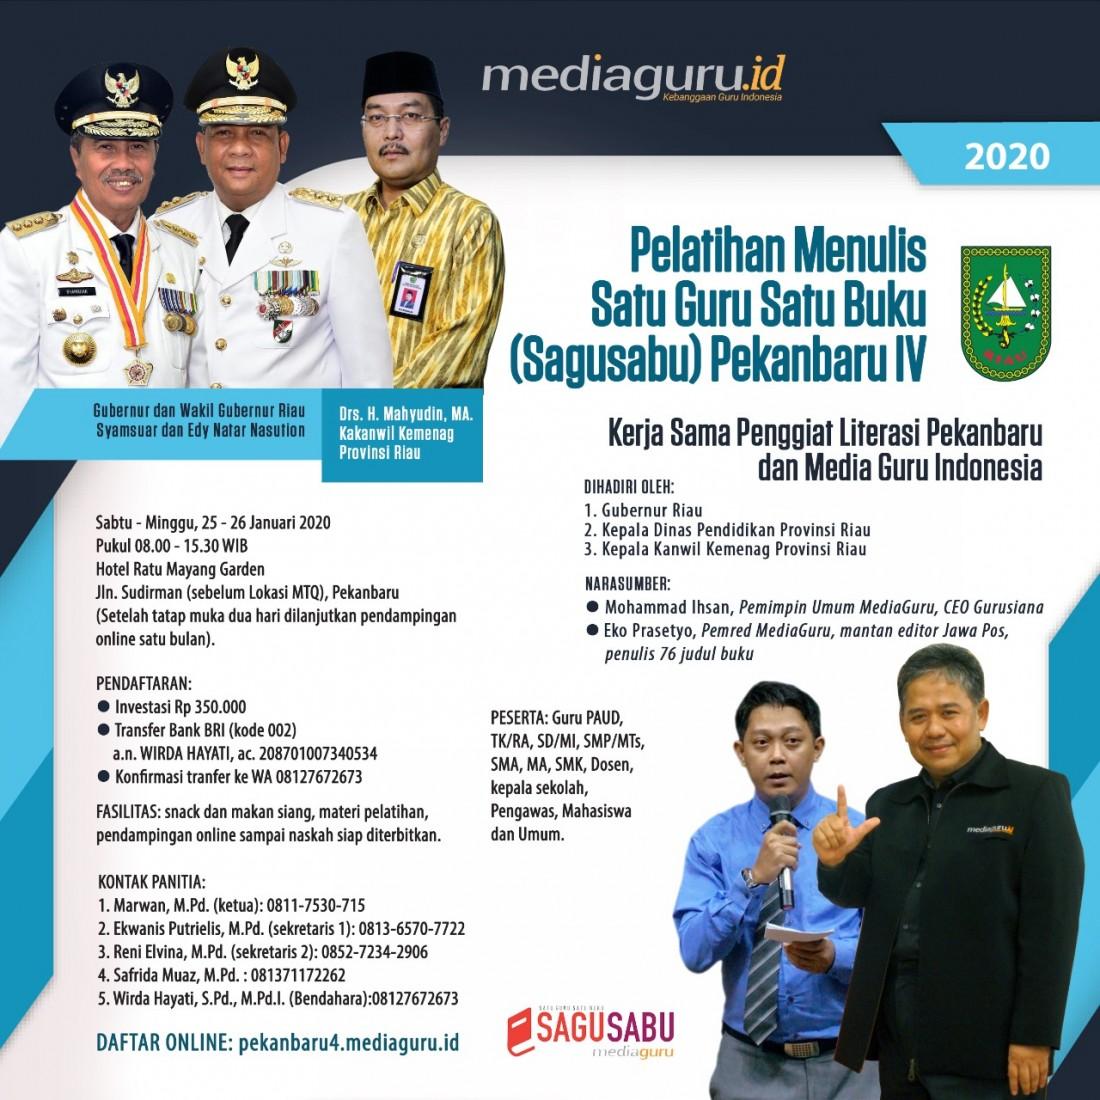 Pelatihan Menulis Sagusabu Pekanbaru IV Riau (25 - 26 Januari 2020)